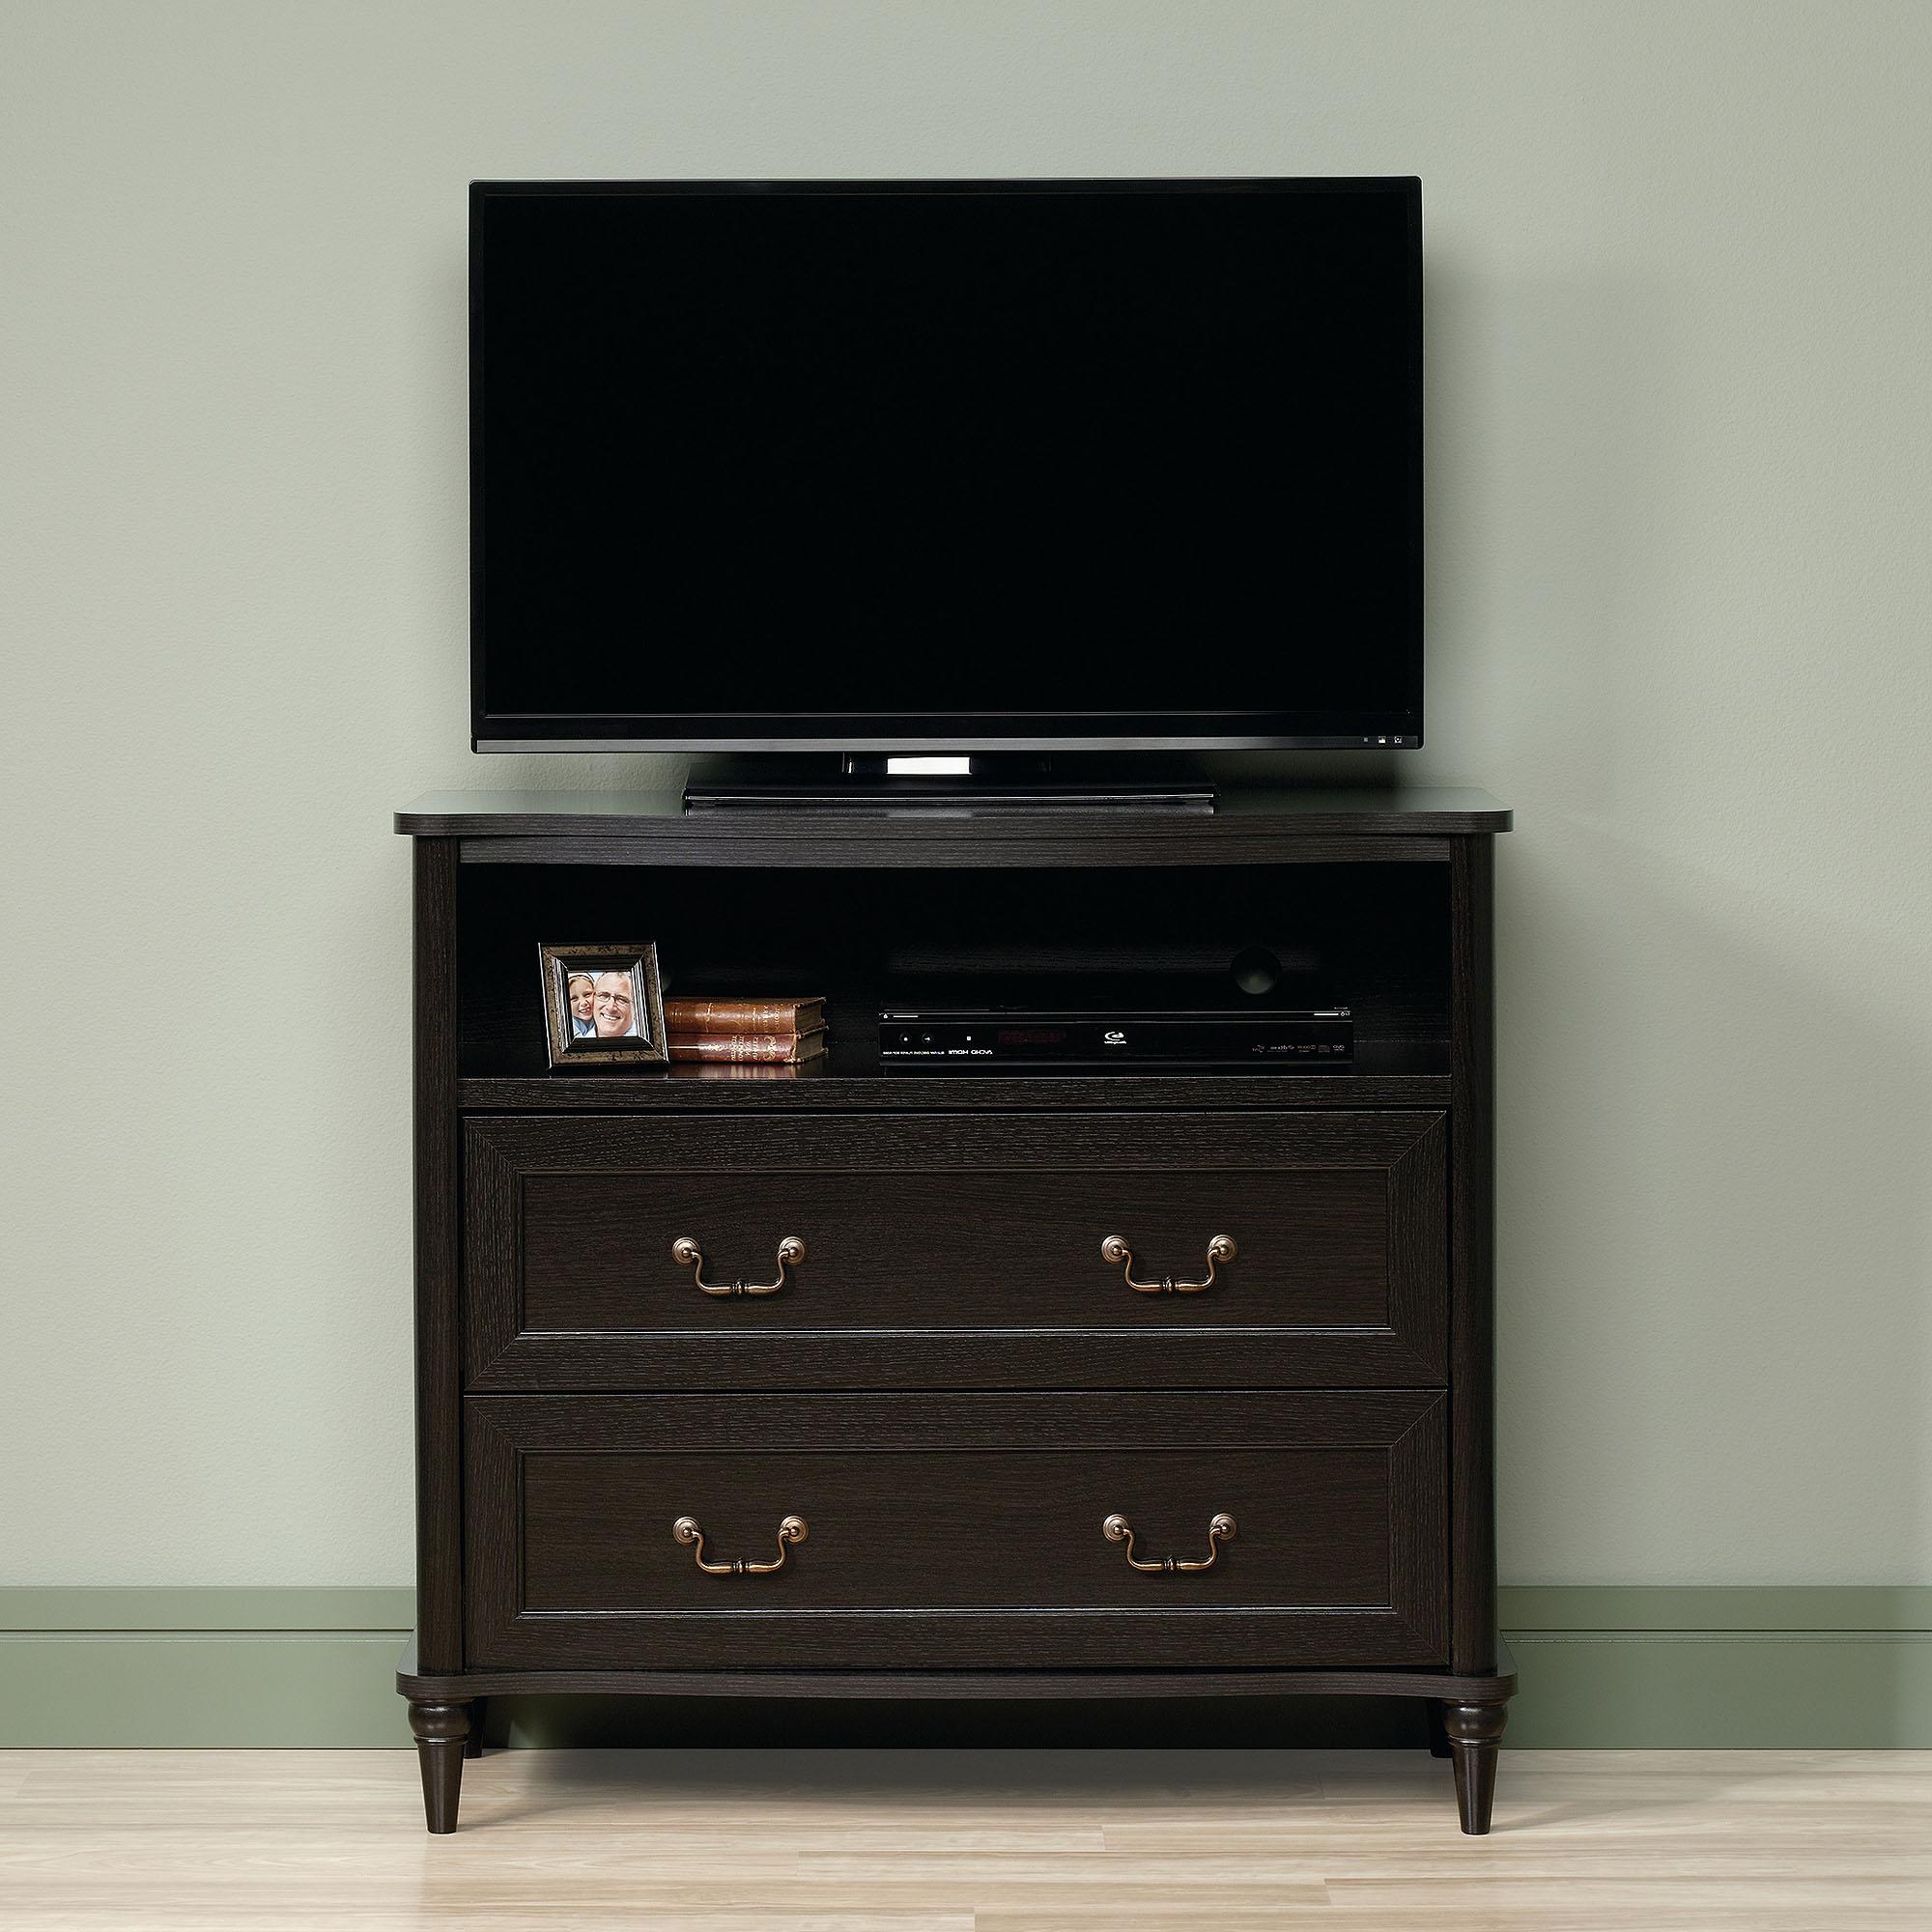 Newest Sauder Wakefield Furniture Collection – Walmart Regarding Wakefield 85 Inch Tv Stands (View 5 of 20)